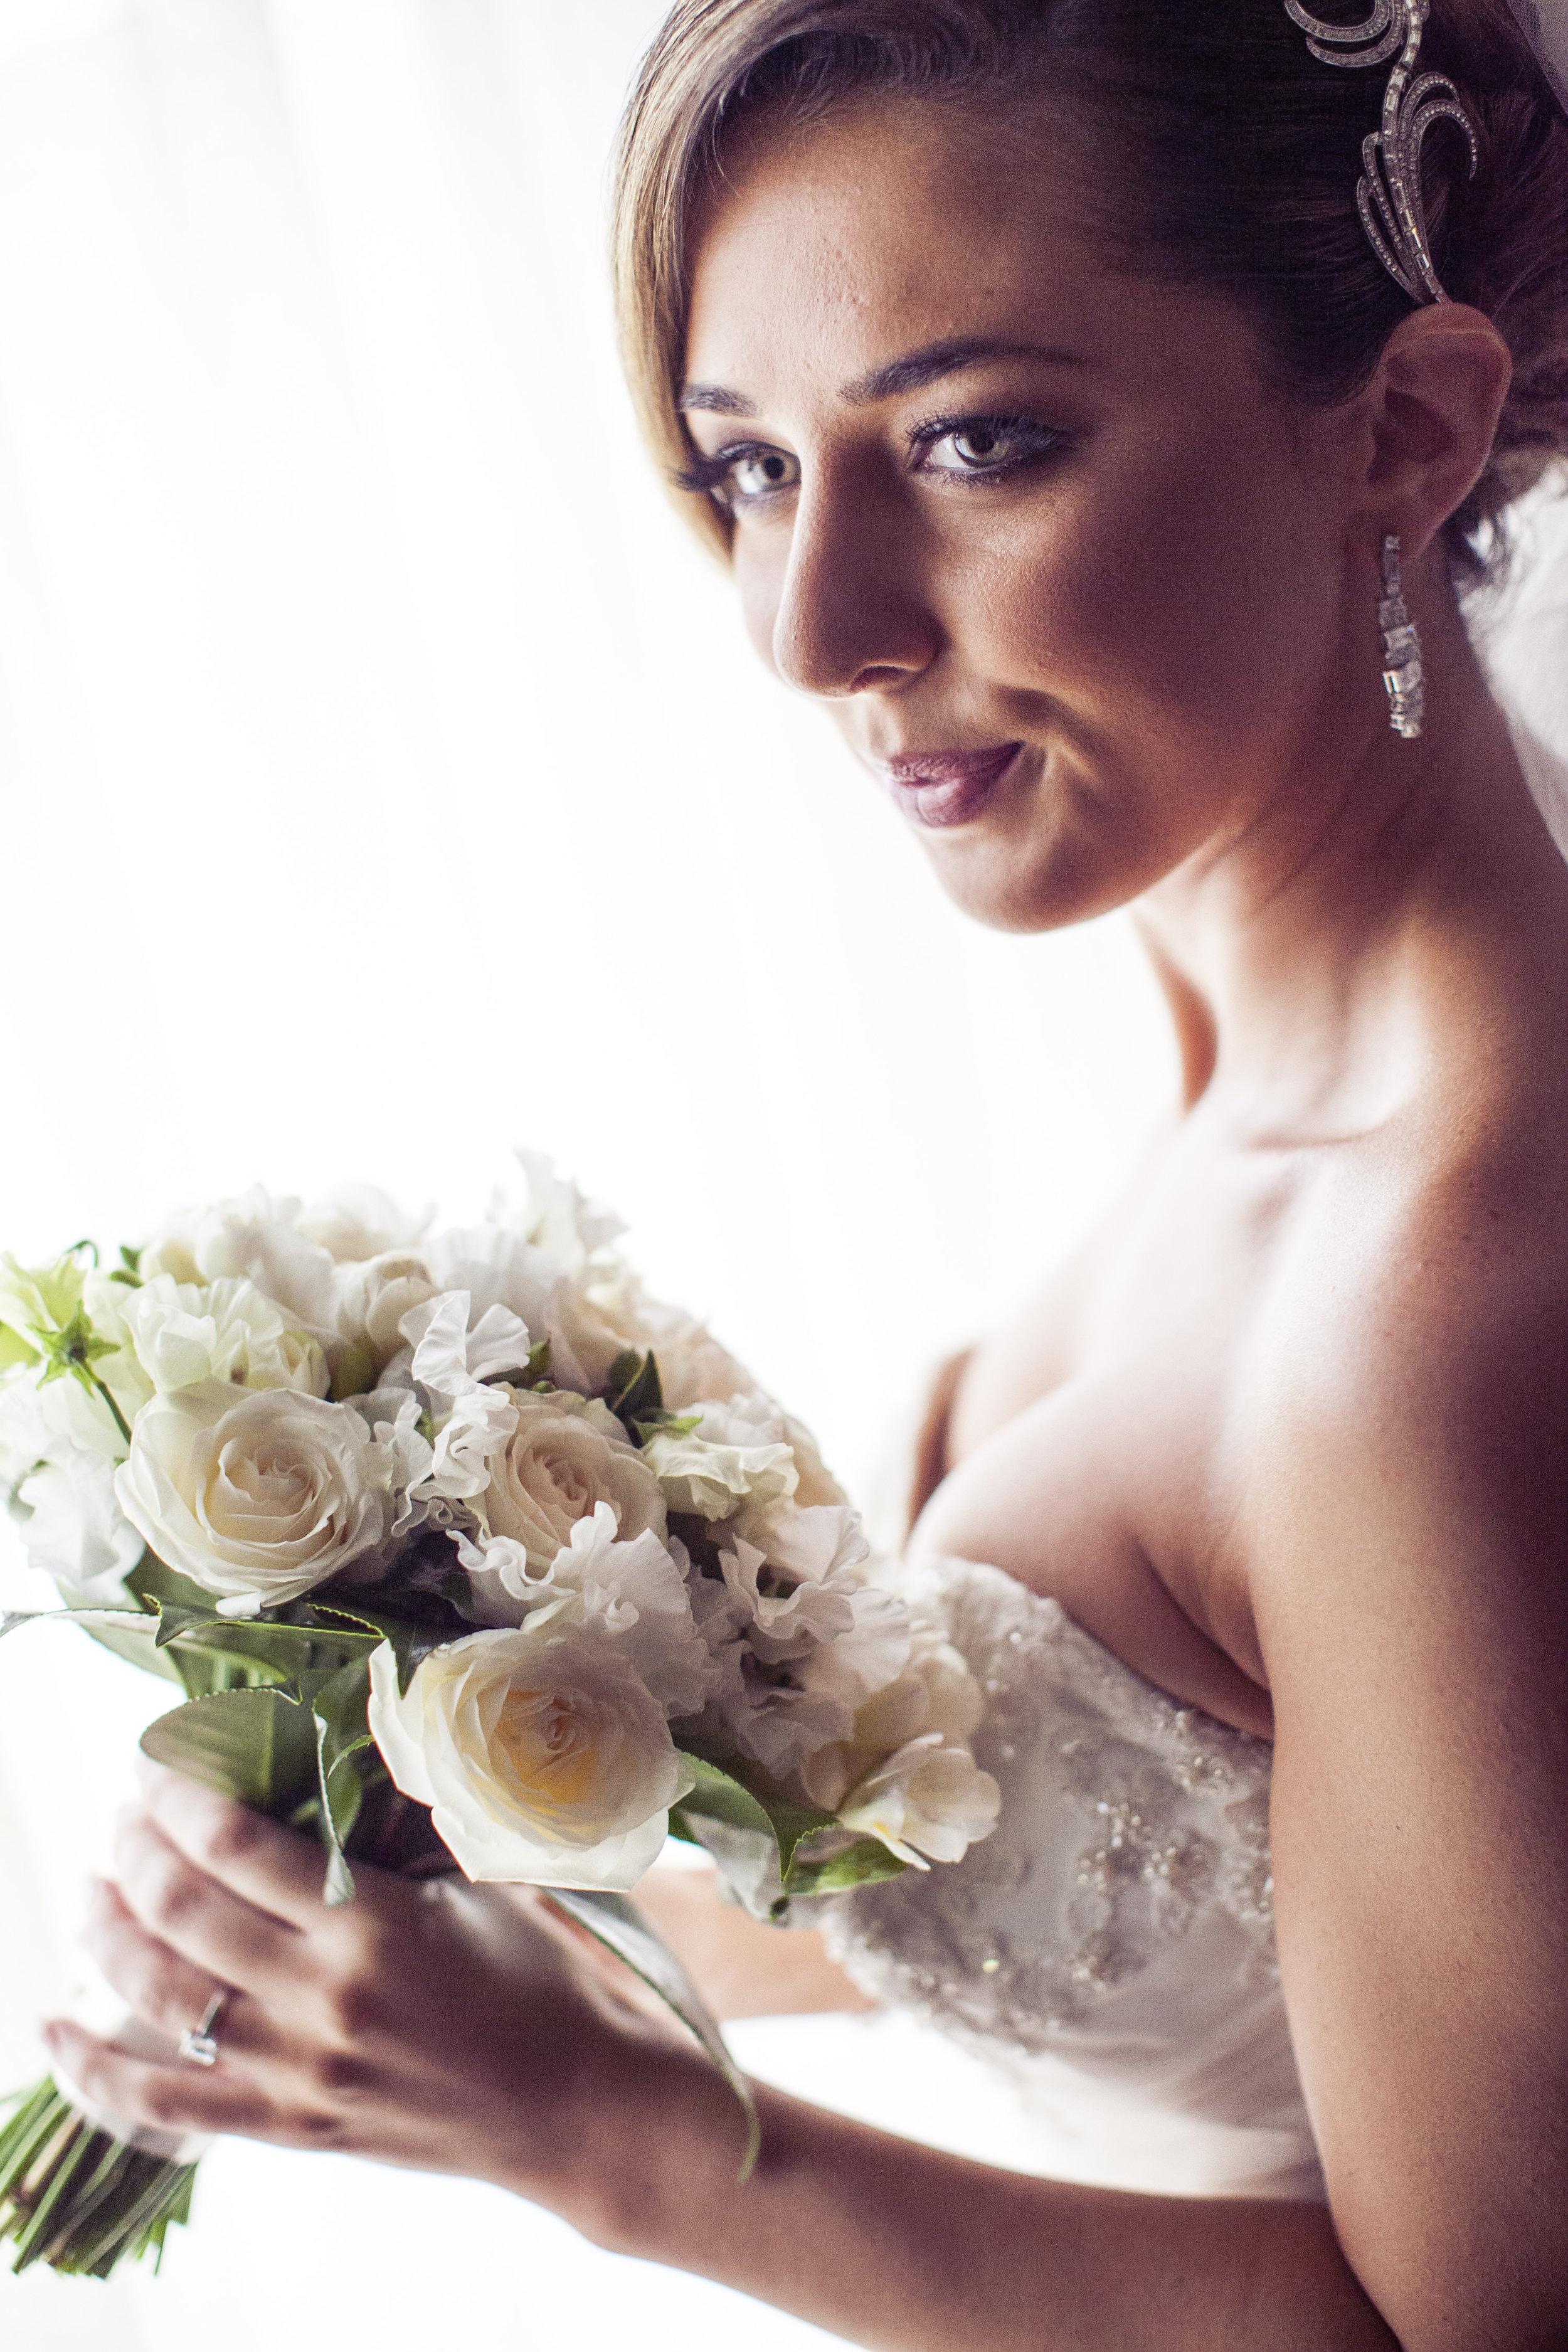 The_Brides_Got_Style_Kristina.jpg